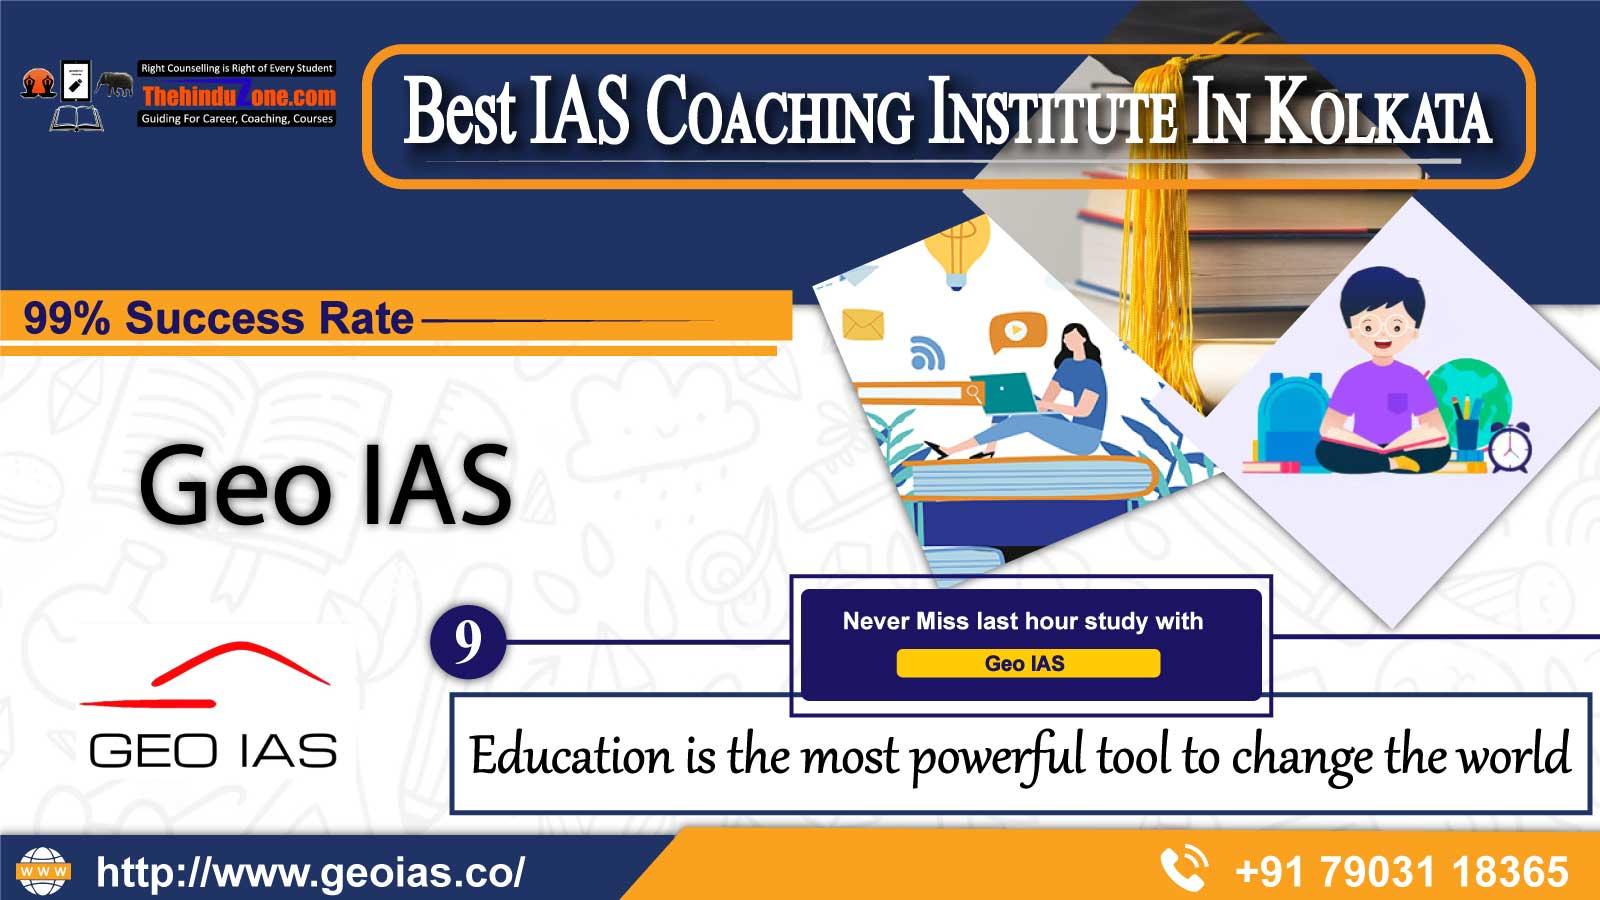 Geo IAS – Best IAS Coaching In Kolkata